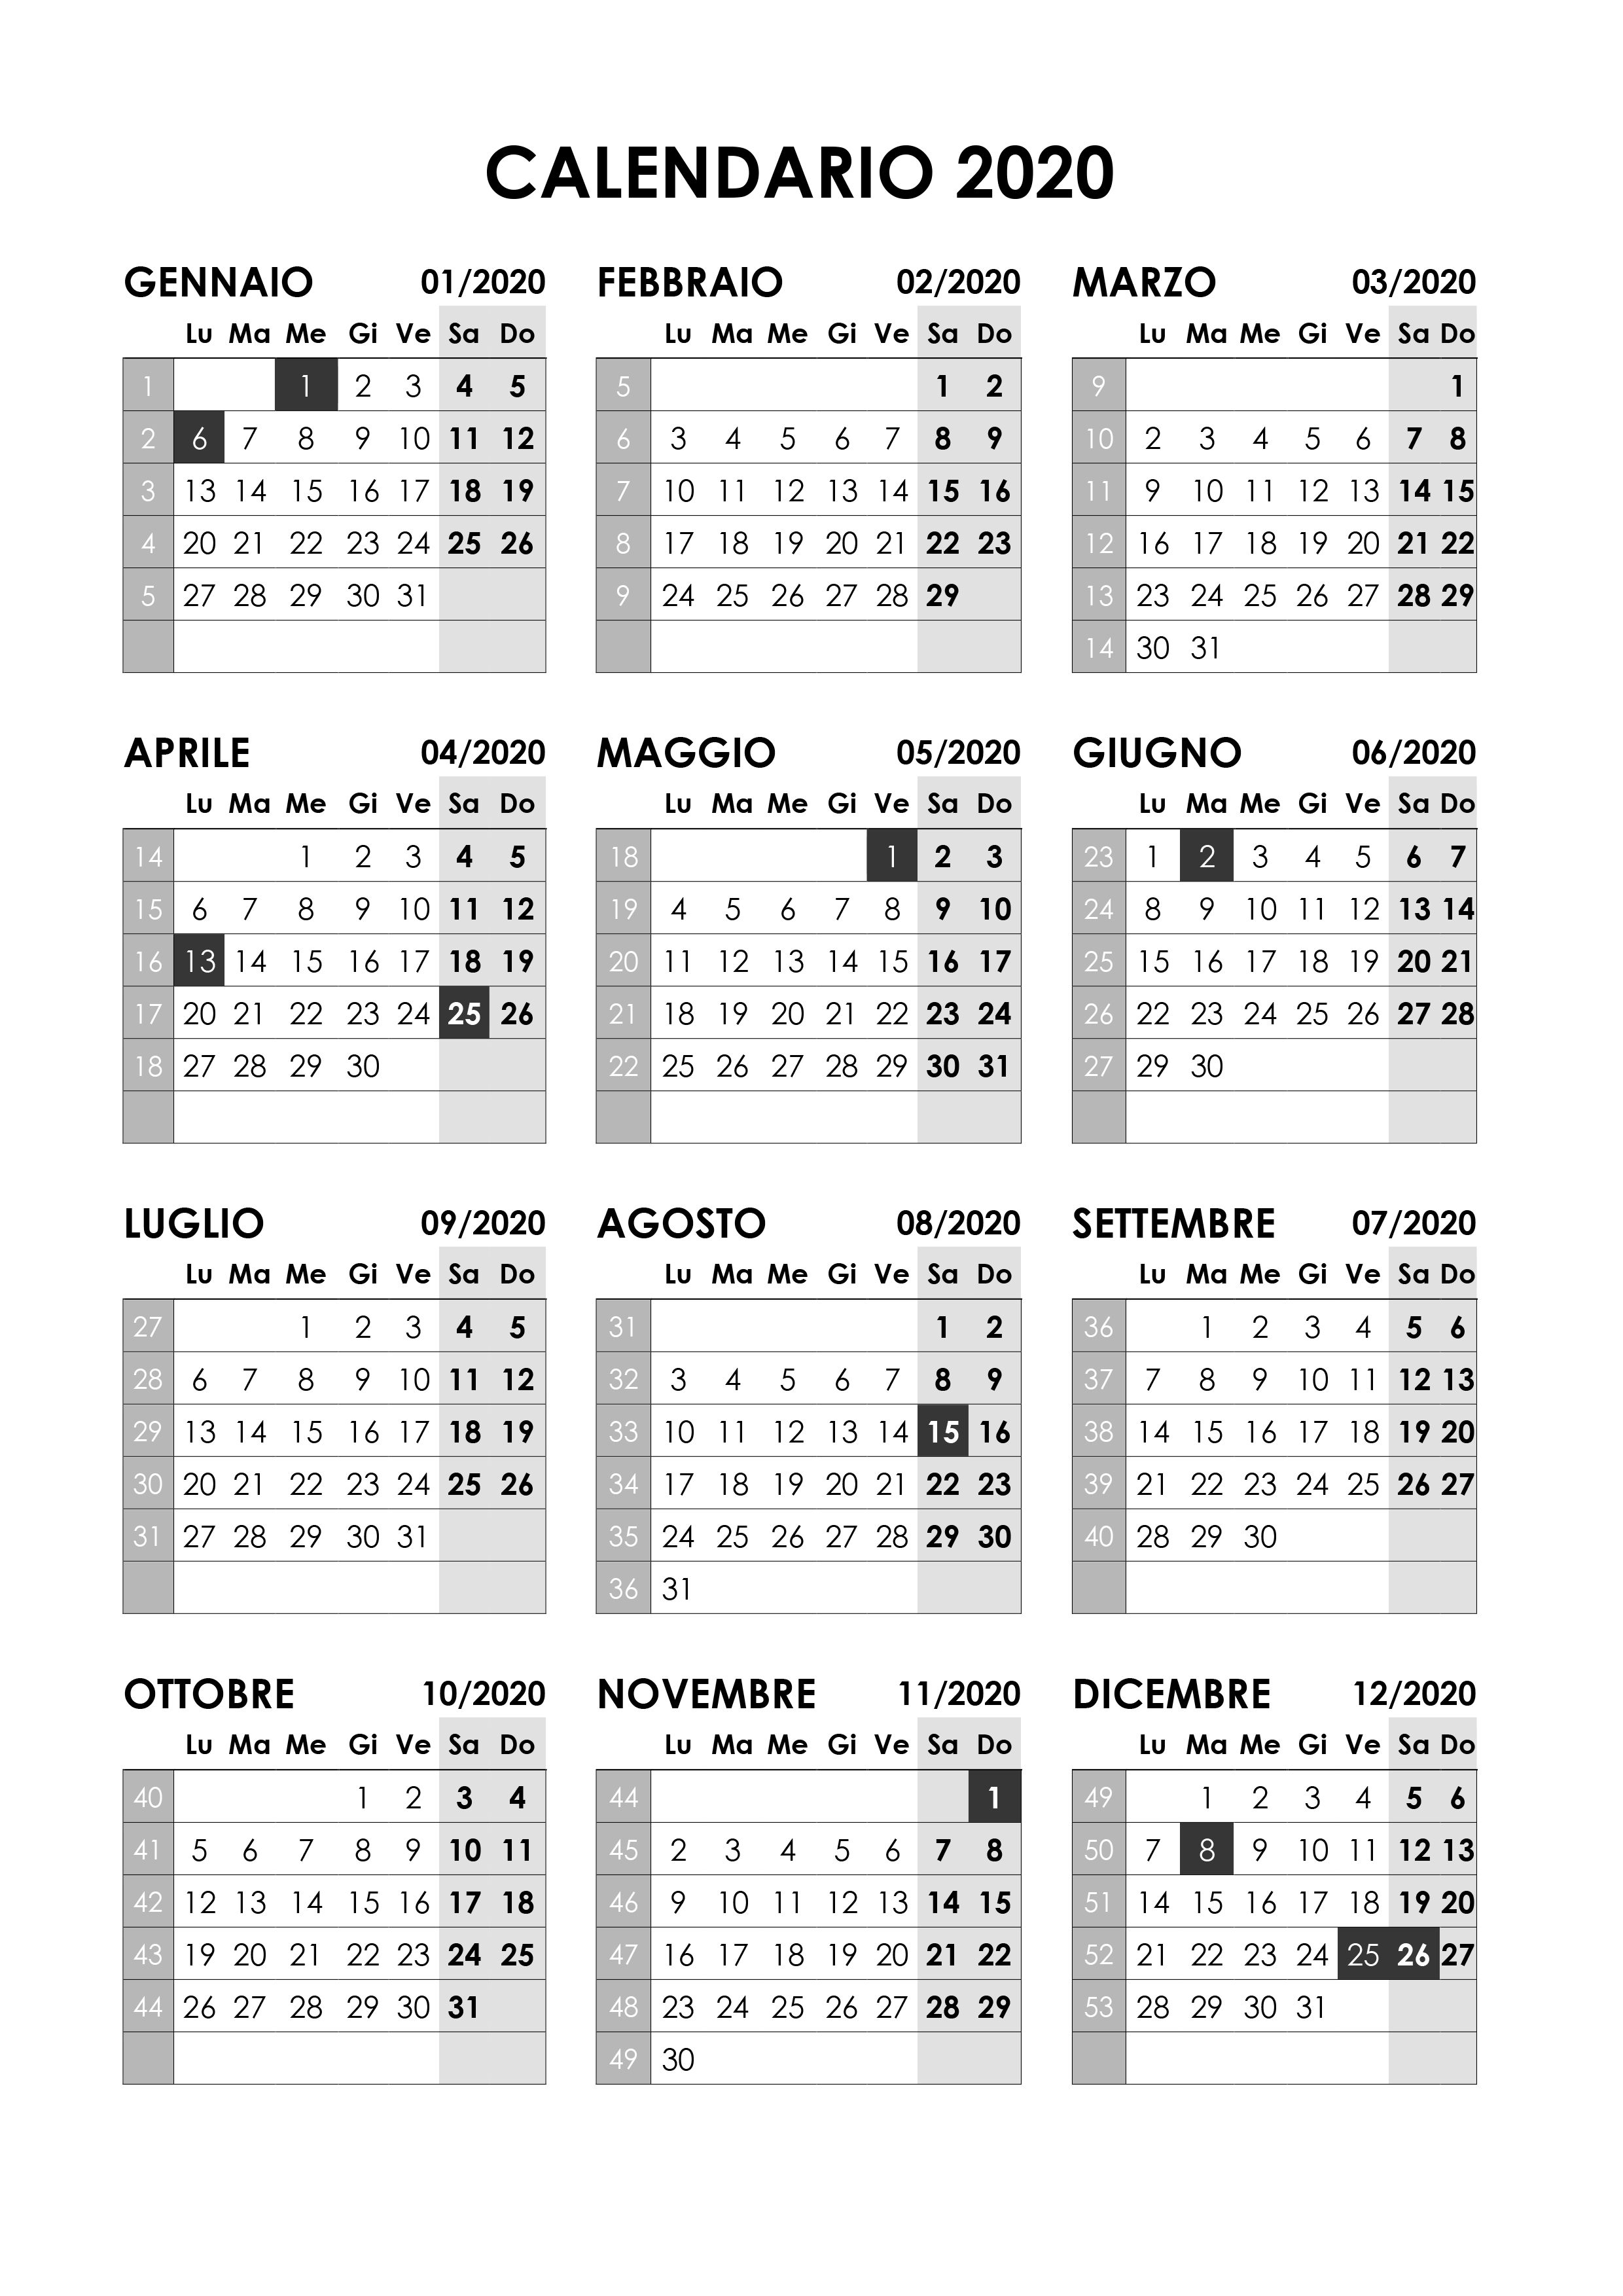 Settimane Calendario 2020.Calendario 2020 Annuale Calendario Su